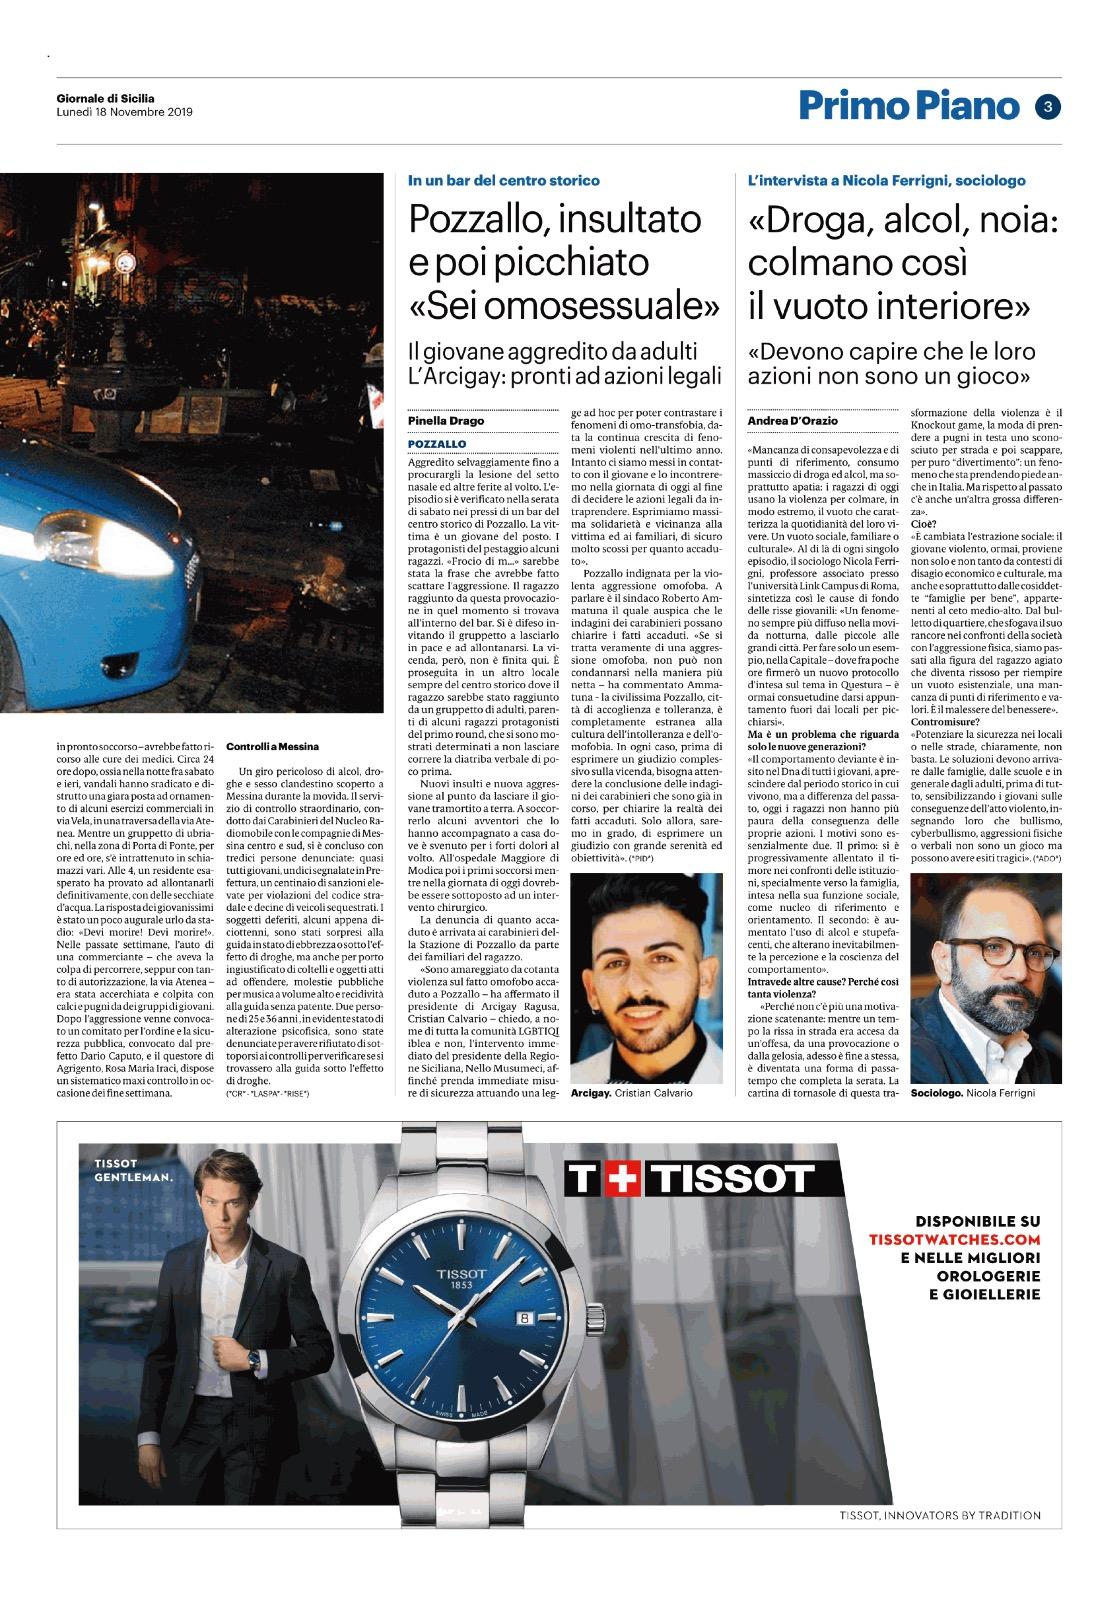 2019_11_18_GiornaleDiSicilia 2